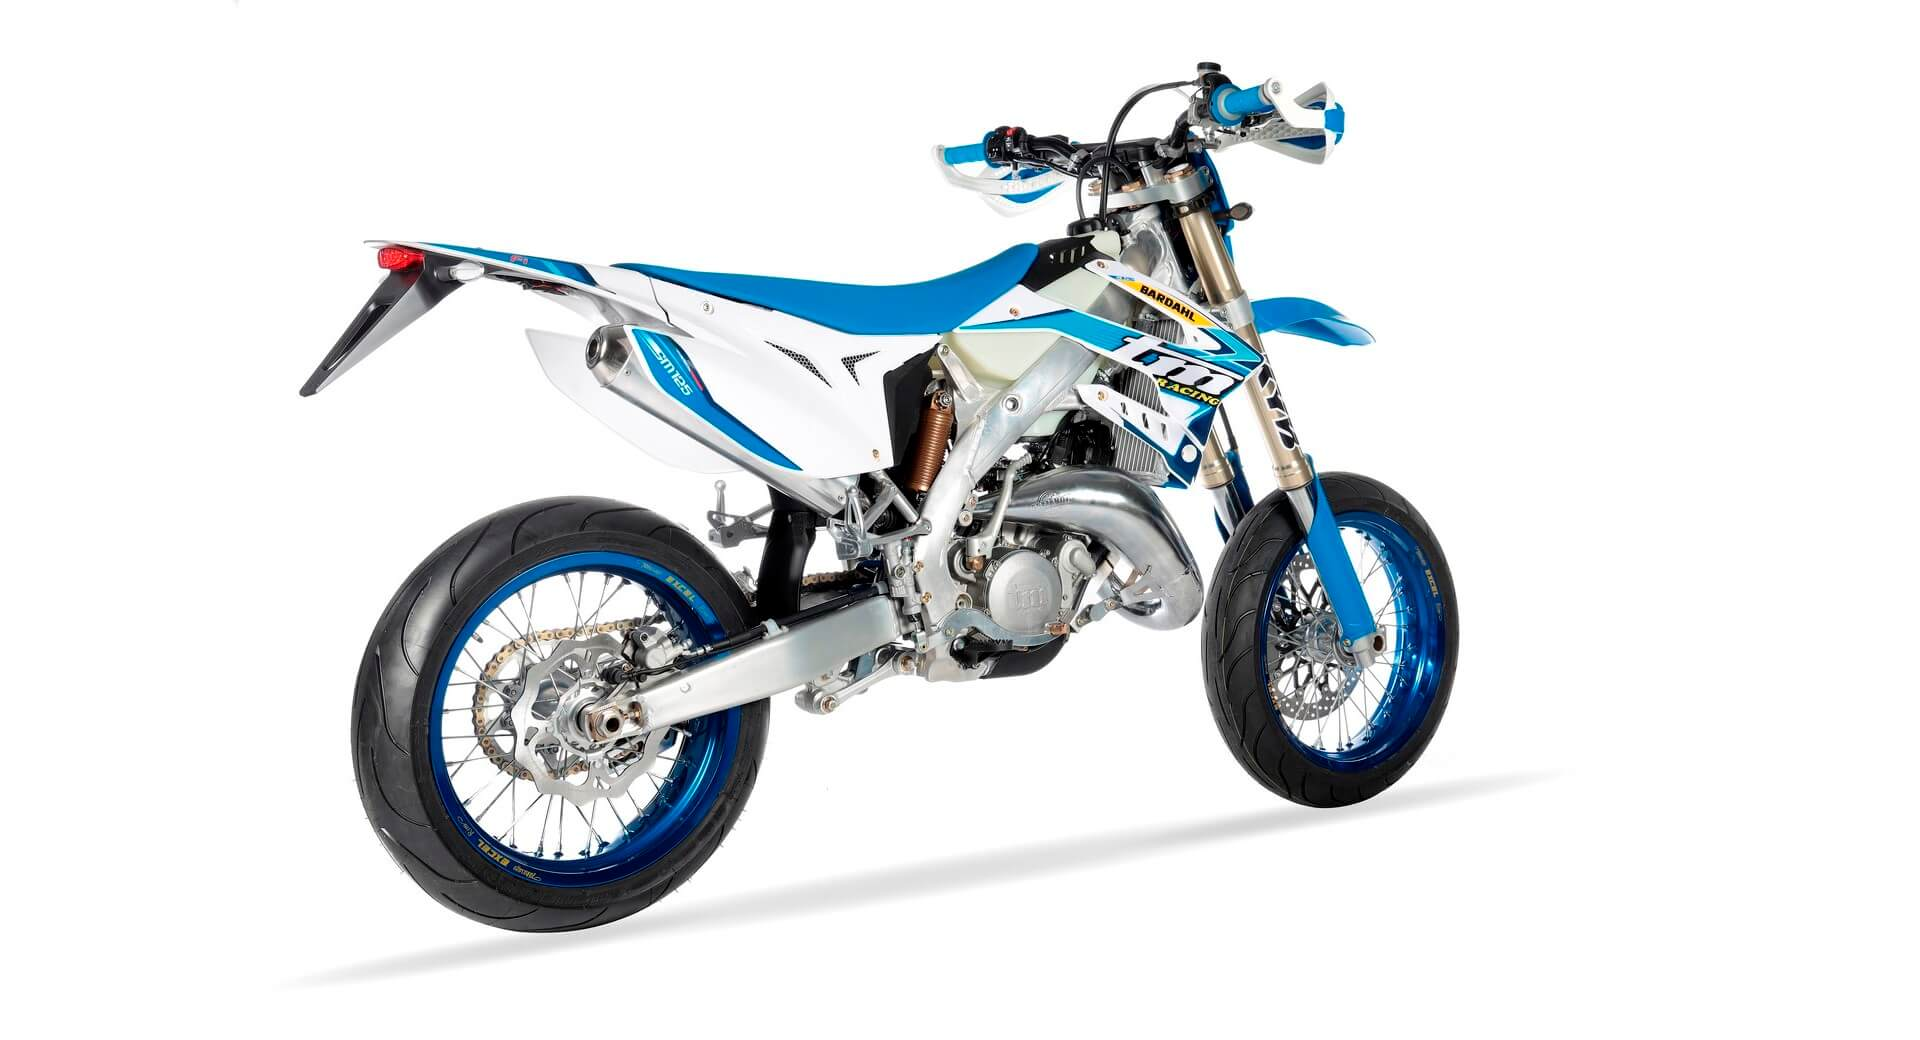 125 smr 125 fi 2t     tm racing 125cc motorcycle smr 125 fi 2t     tm racing